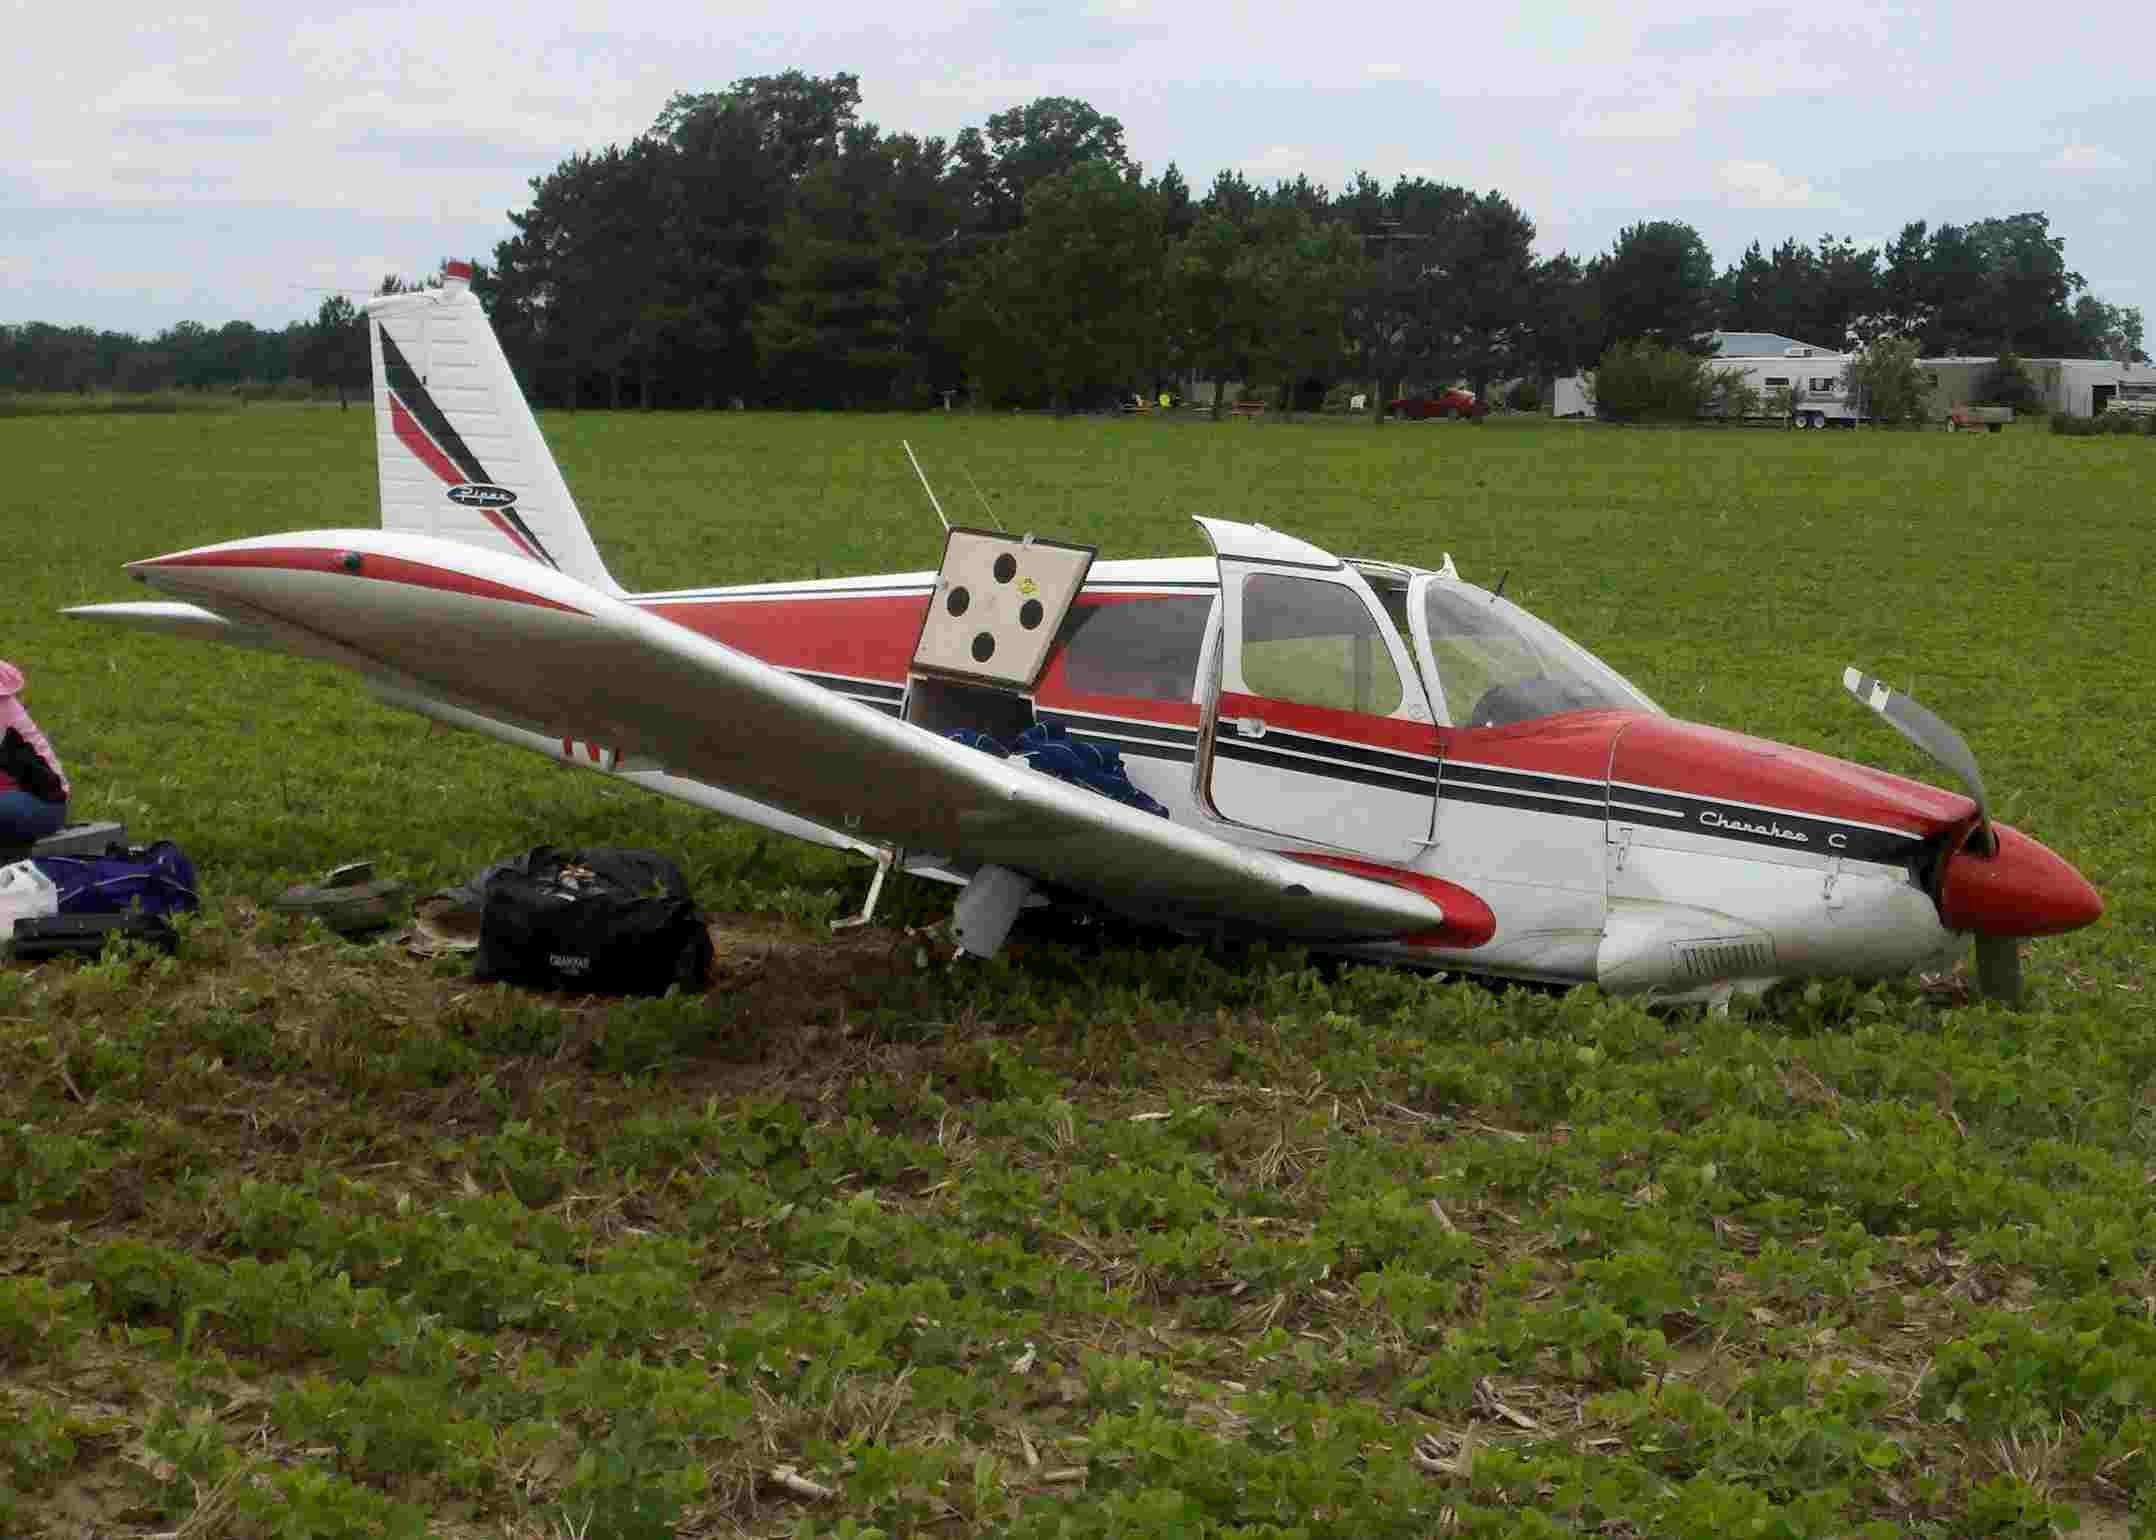 Small Plane Crashes In Barron County Wkow 27 Madison